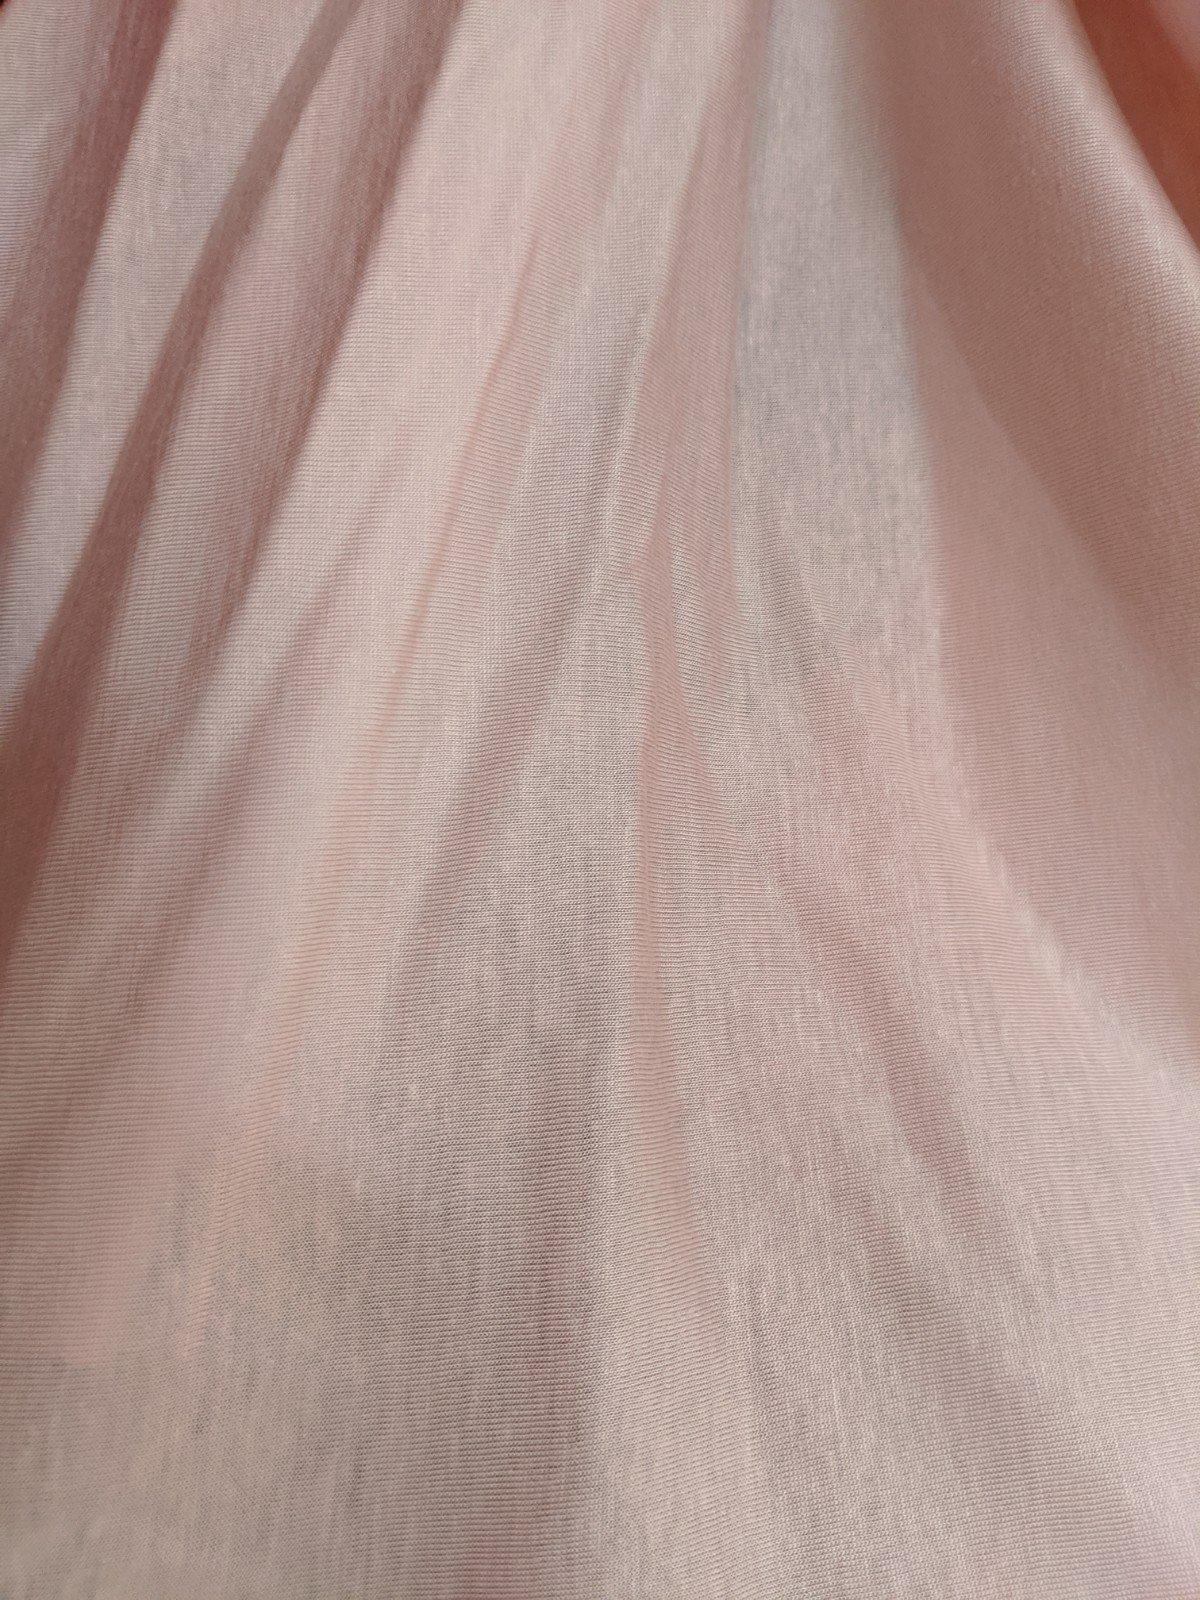 Italian Tissue Jersey Knit (Multiple Colors)